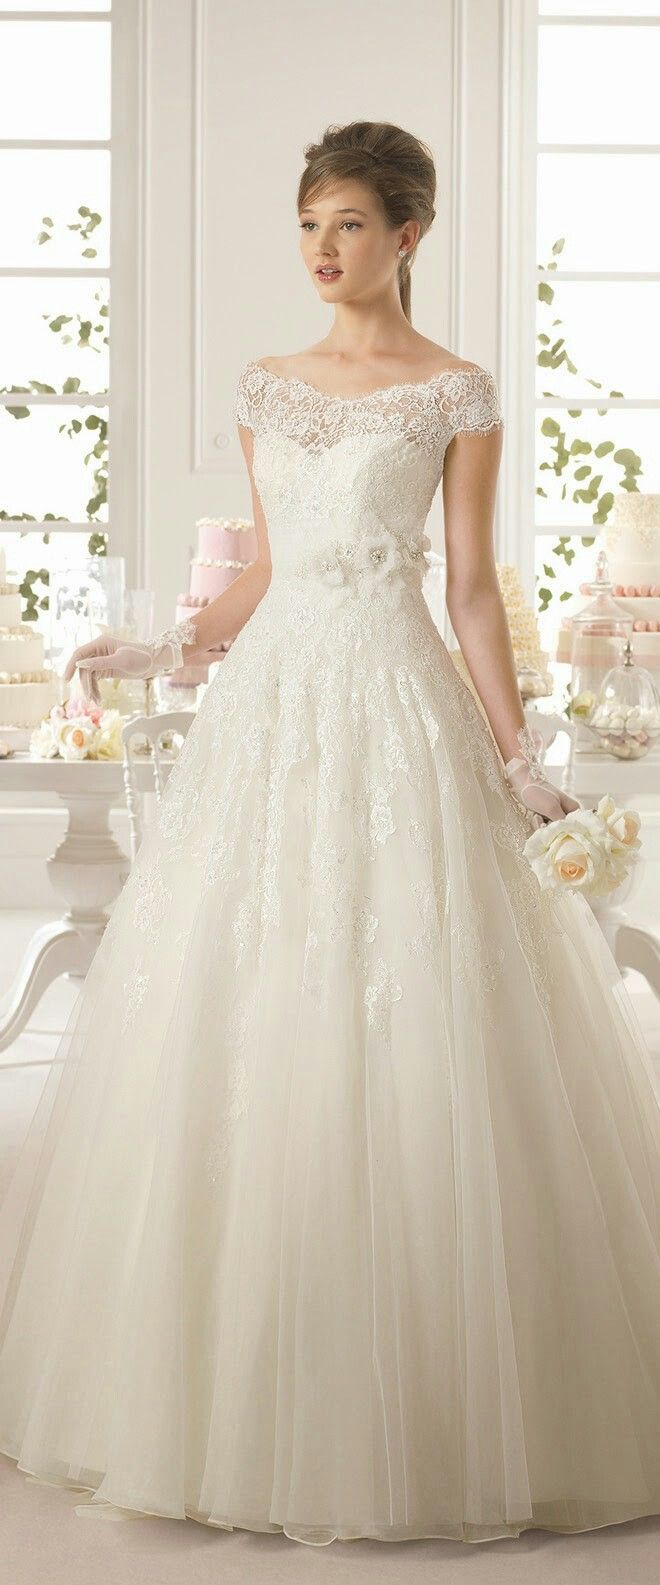 Pin von Anna Lozano auf Wedding things & rings | Pinterest ...